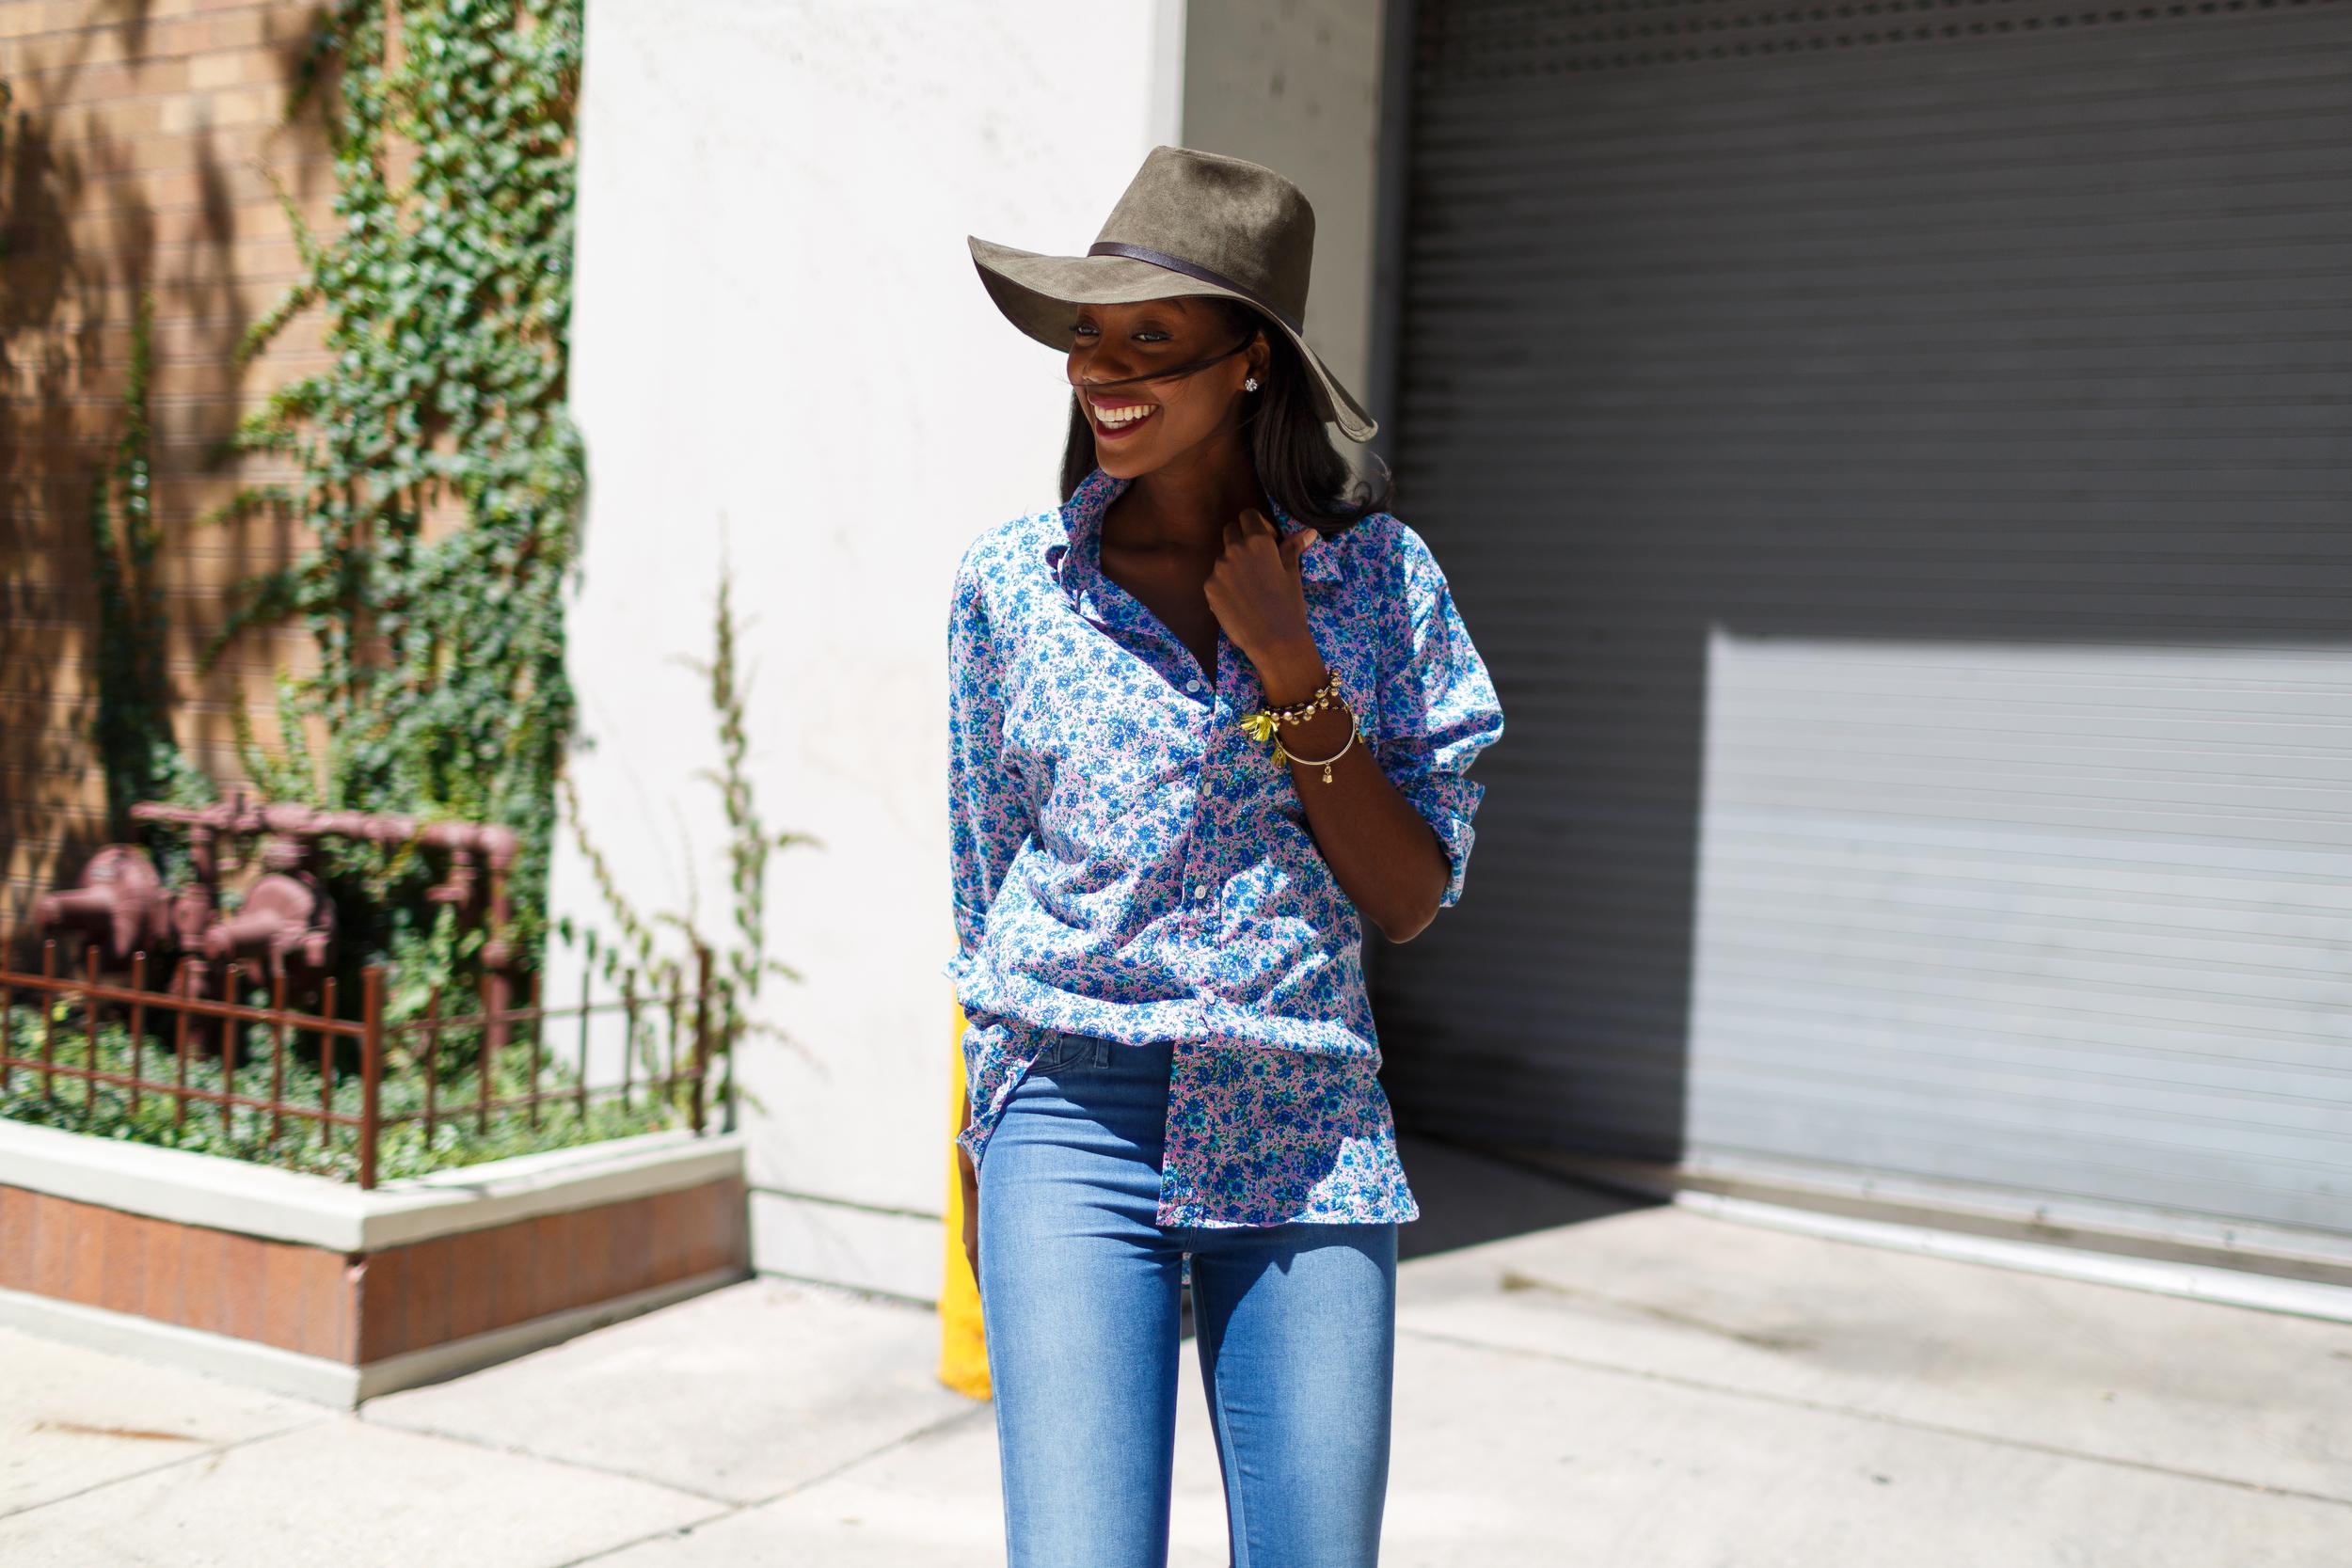 Afua Rida Styled By Rida Ghana Fashion Blogger African Blogger Polo Boyfriend shirt Louboutin top Shop Zara Hat Chicago Downtown Infrusture  Fashion Stylist African Blogger 2.jpg